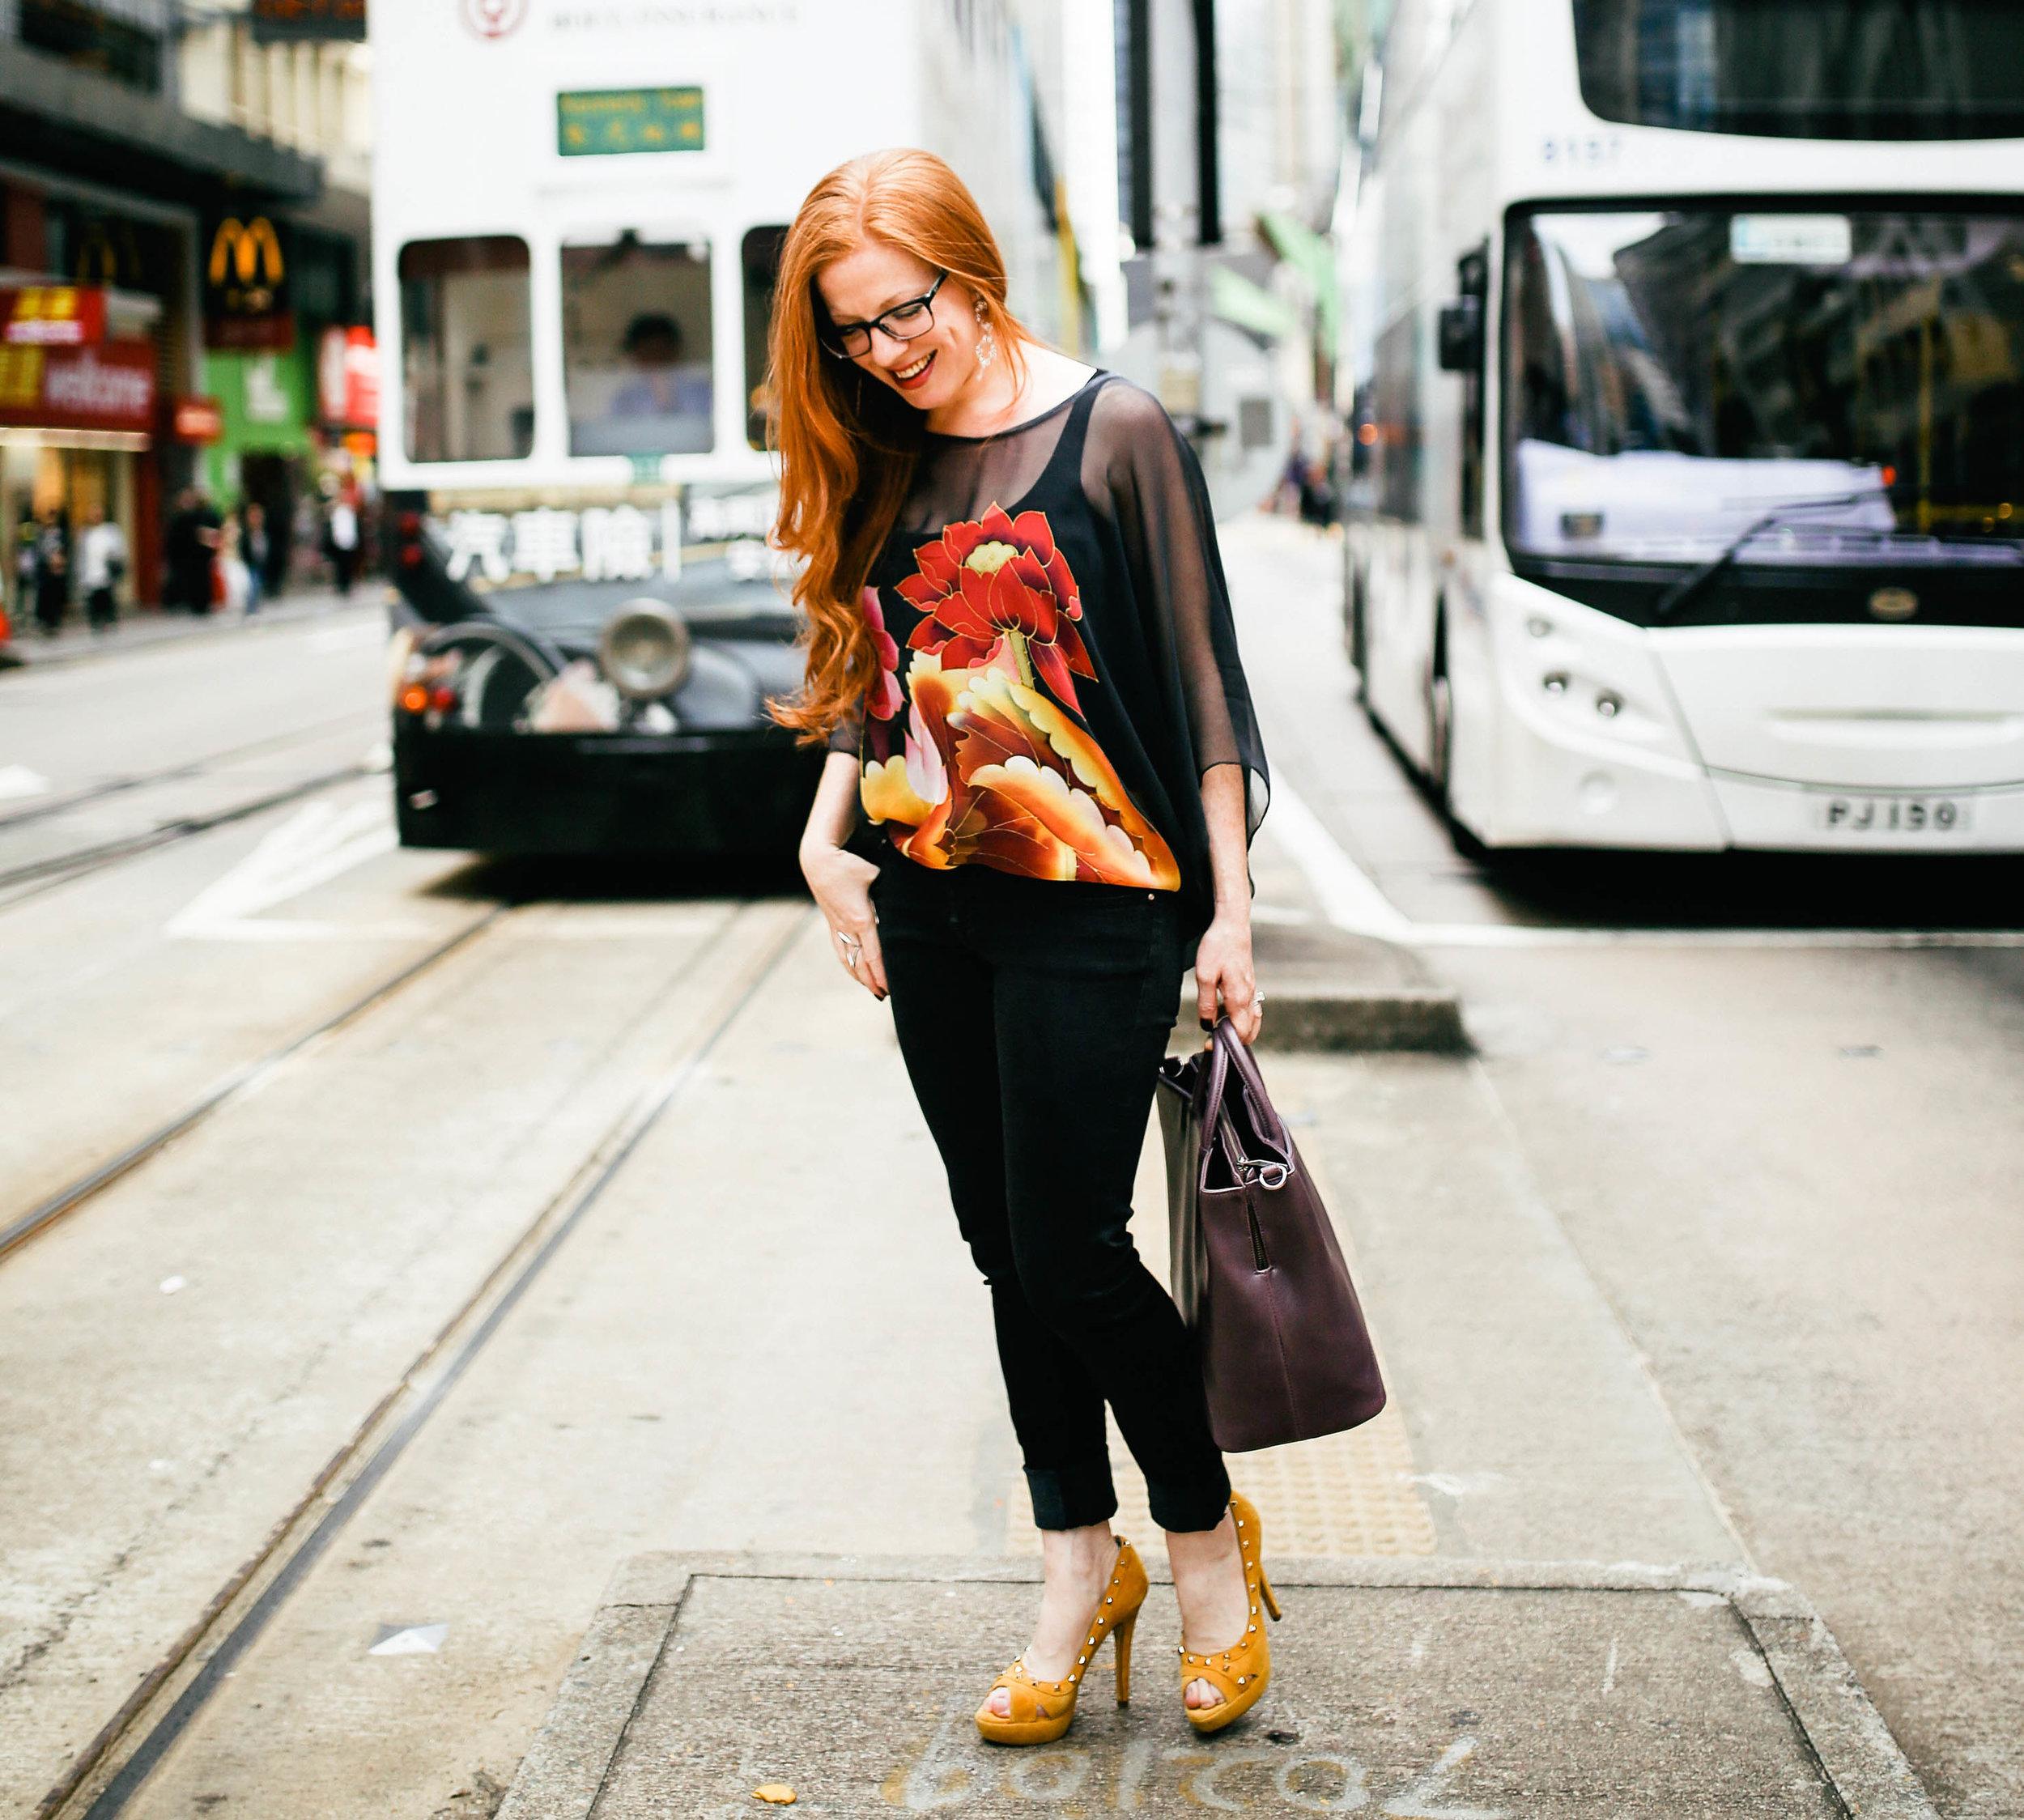 Nathalie-Melville-6.jpg